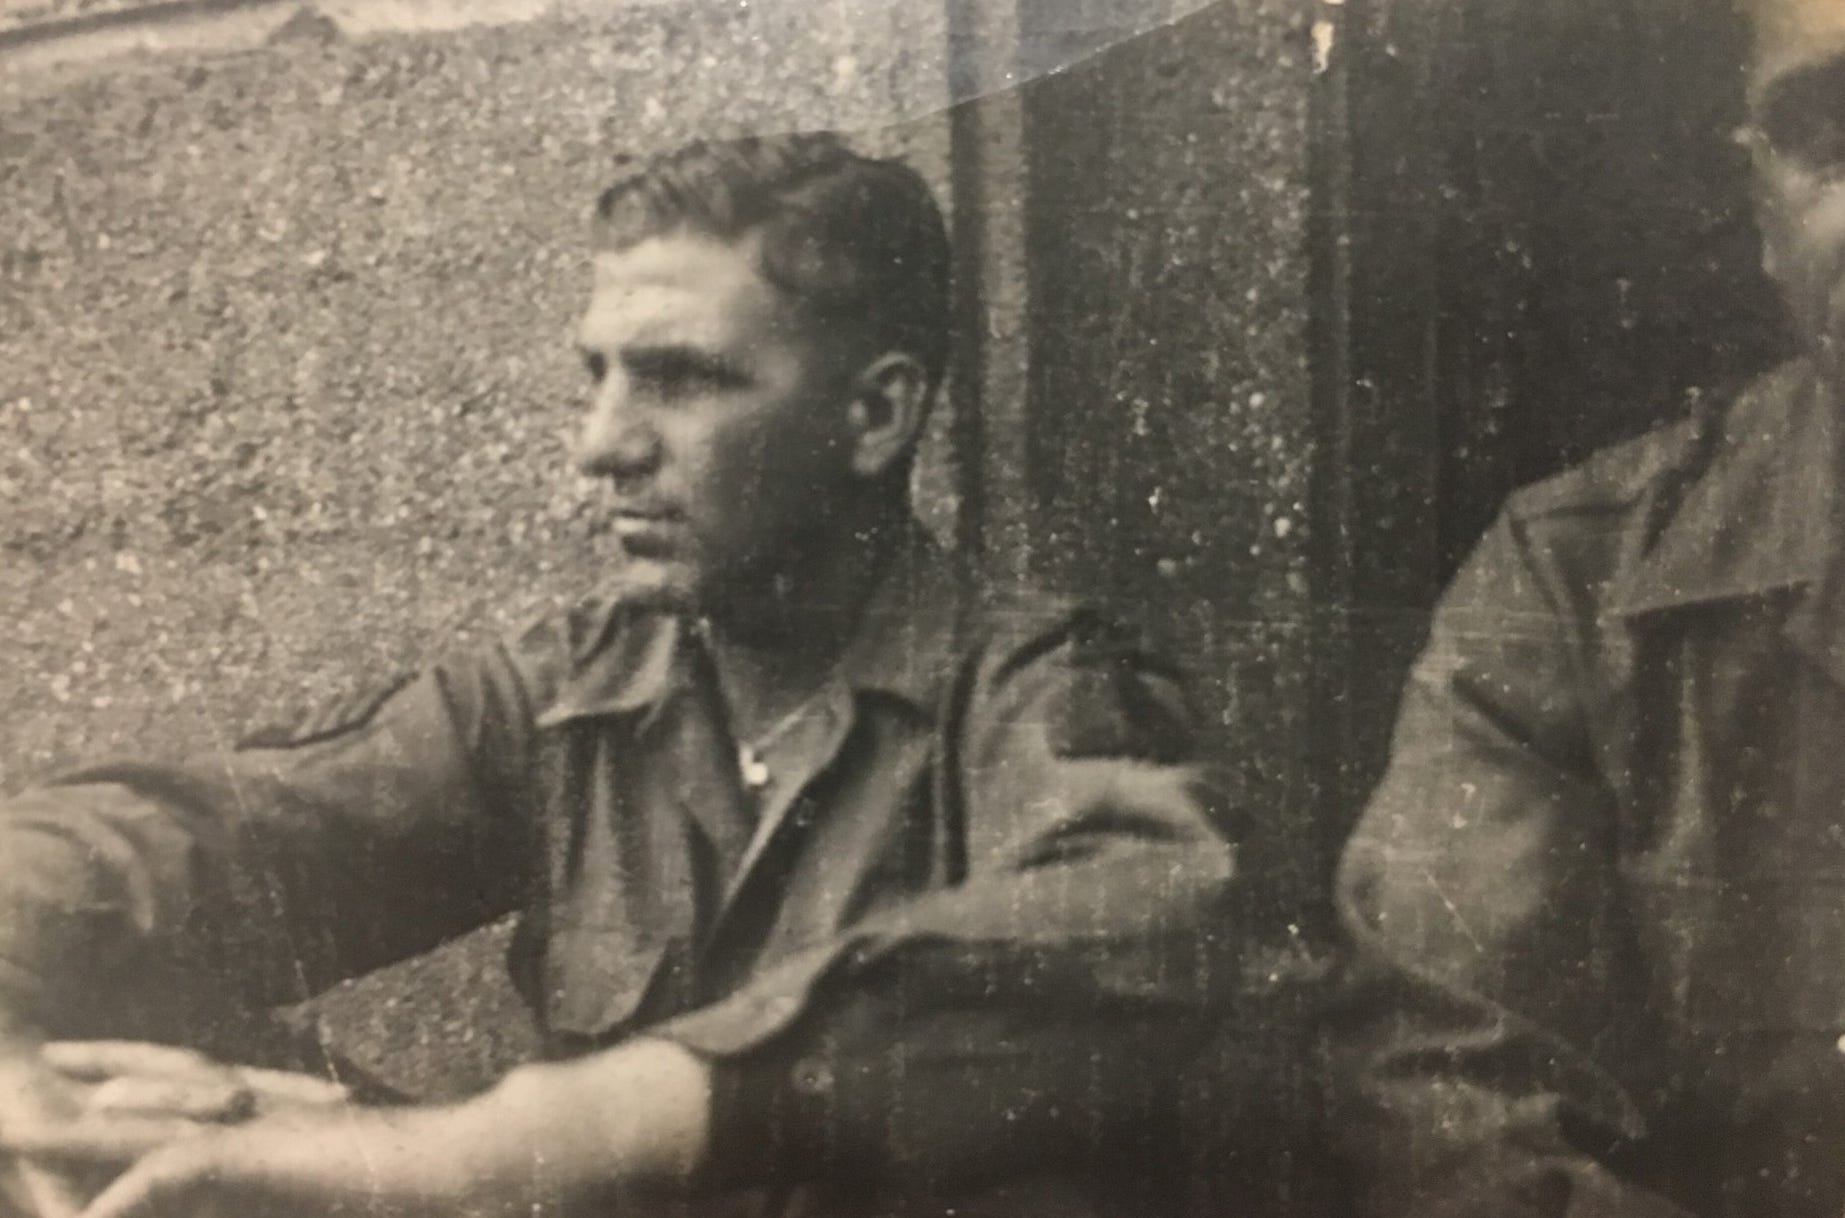 Carl Mann in October 1944.